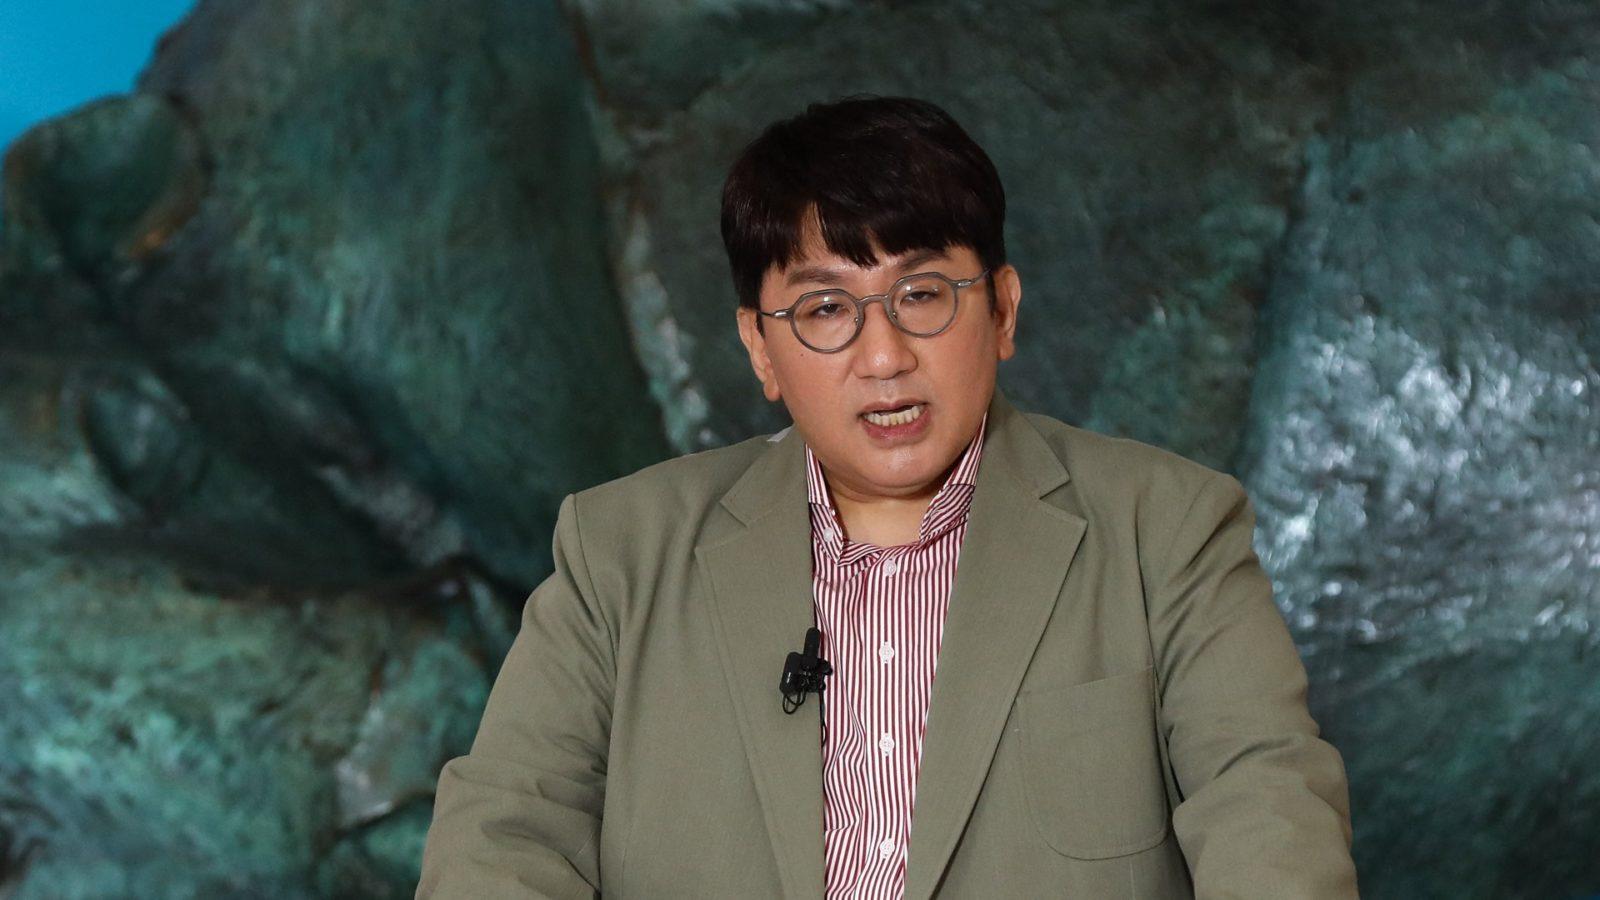 Meet Bang Si-hyuk, the Man Behind the Success of BTS and Other K-Pop Idols